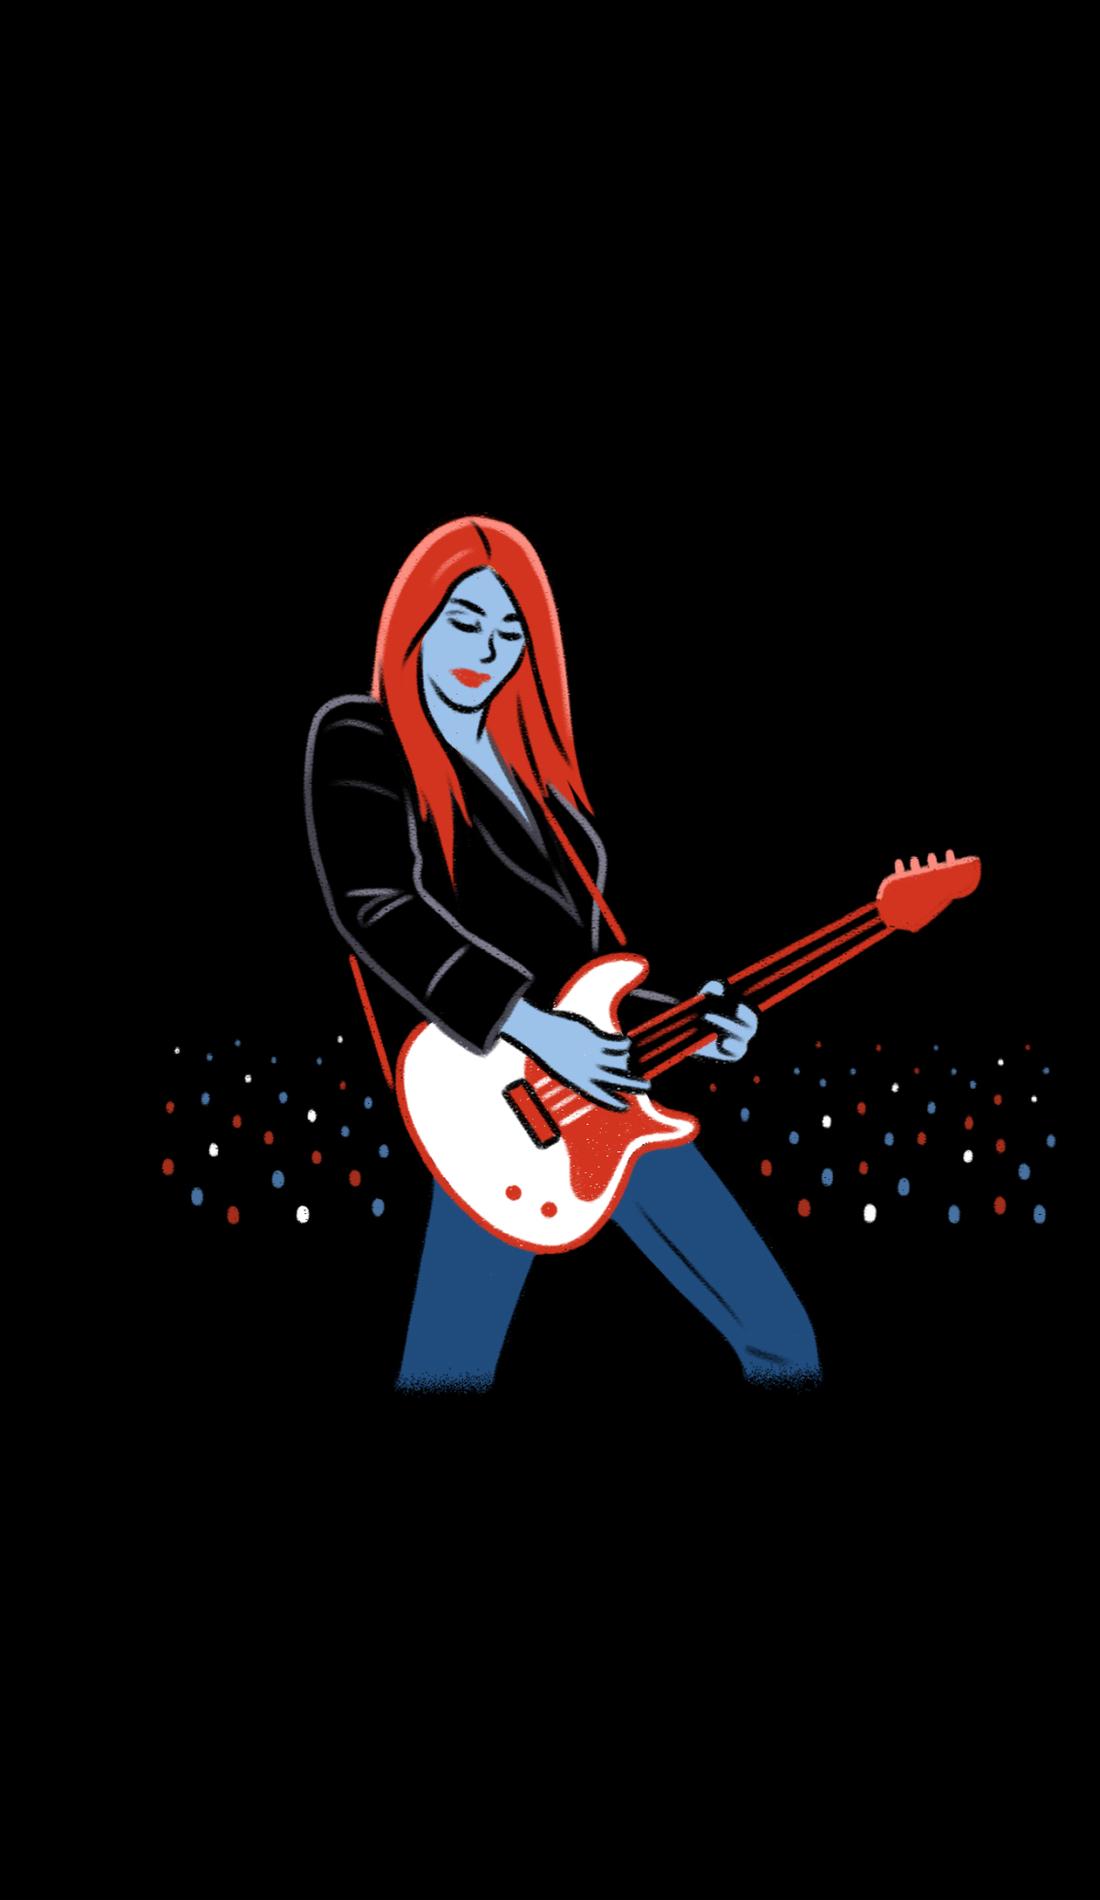 A Hyperglow live event